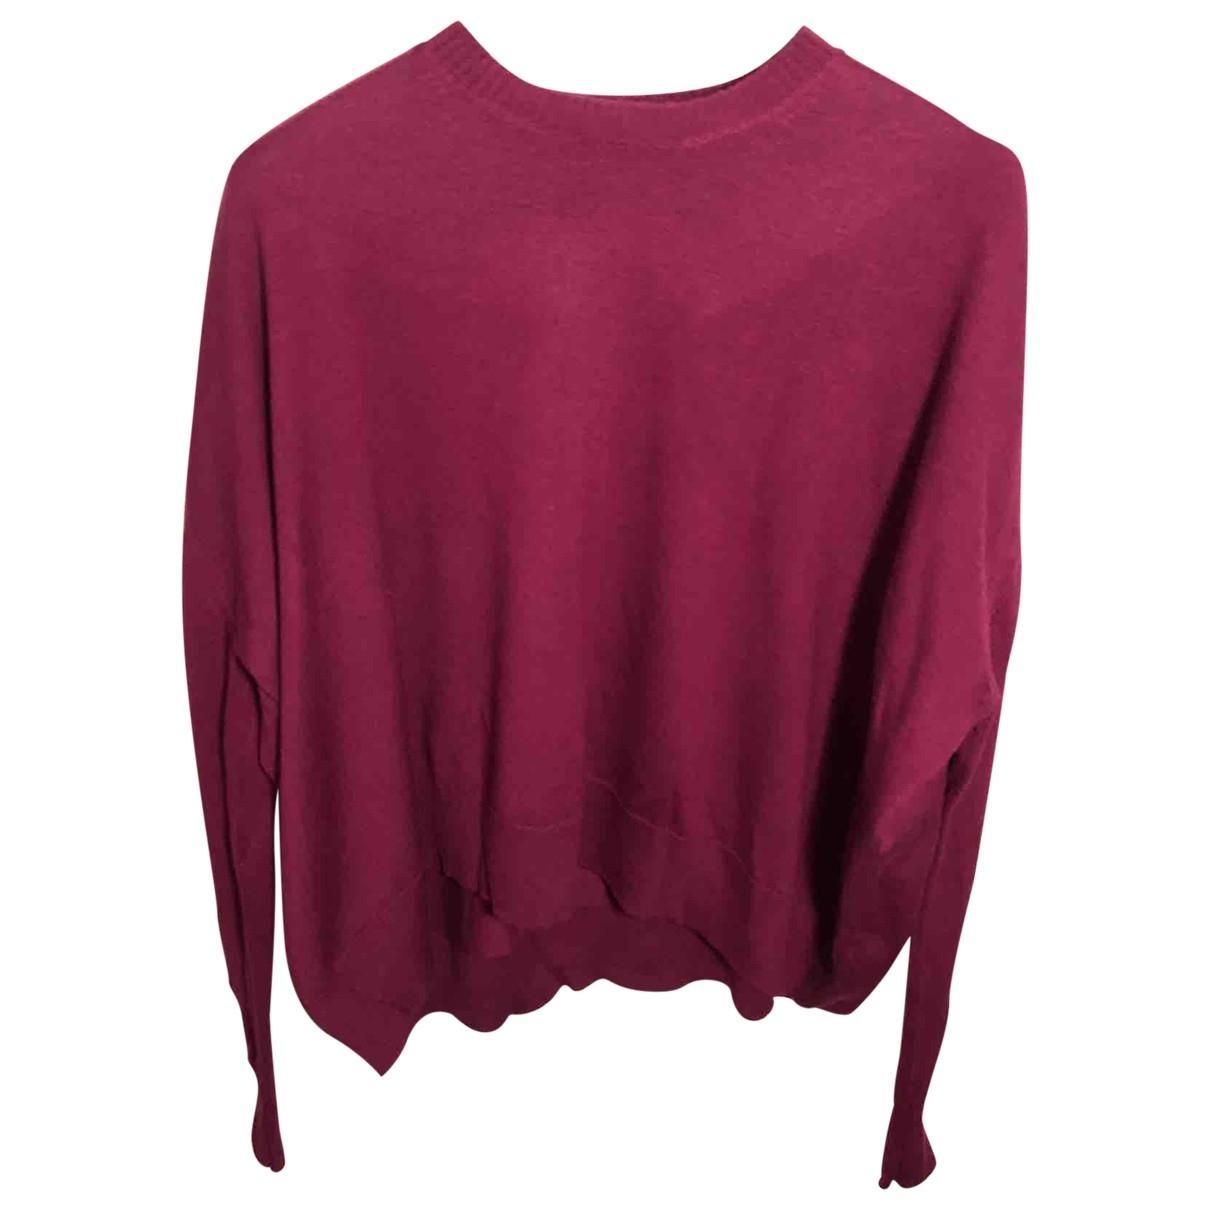 Diesel Black Gold \N Burgundy Wool Knitwear for Women XS International